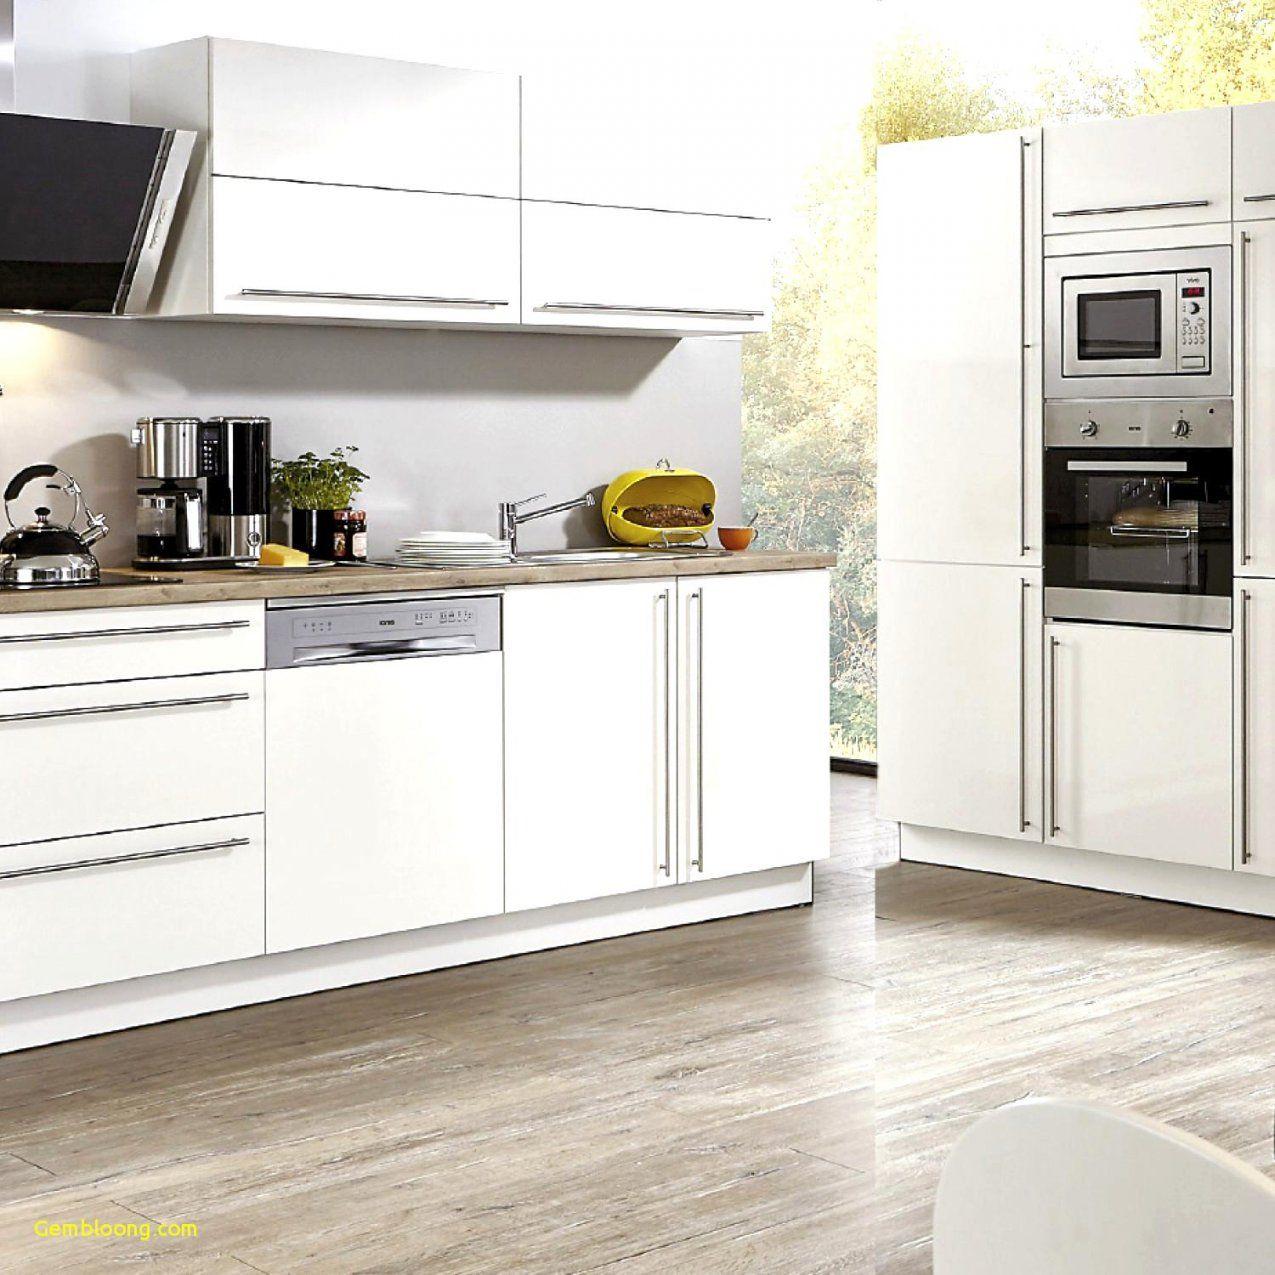 Bank Selber Bauen Küche Möbel Aus Paletten Bauen Anleitung Avec